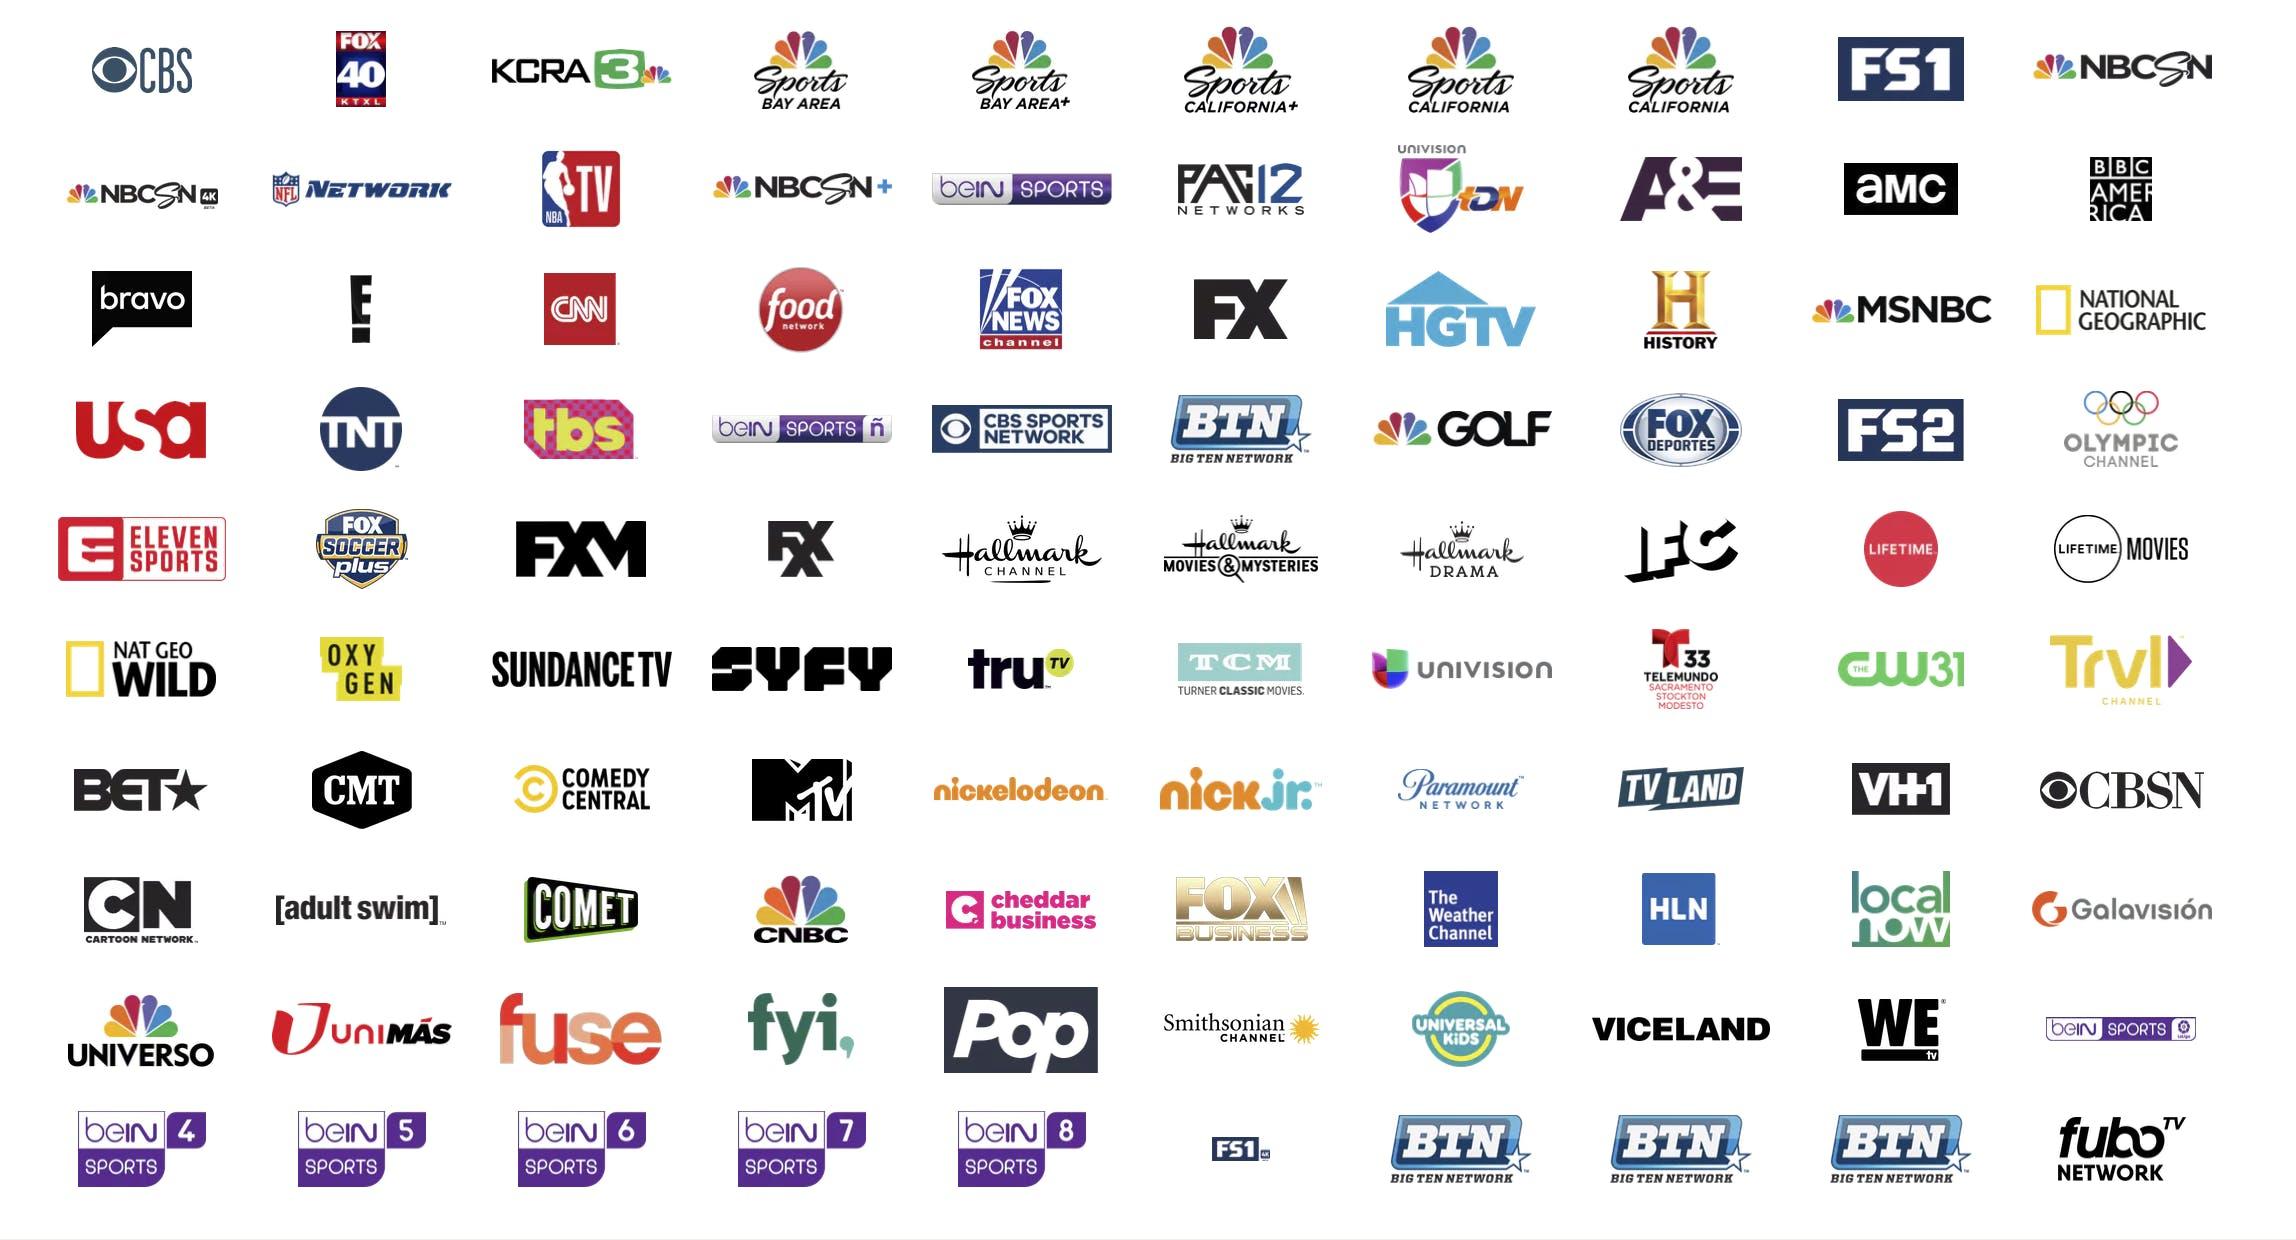 watch Desi Lydic abroad online free on FuboTV